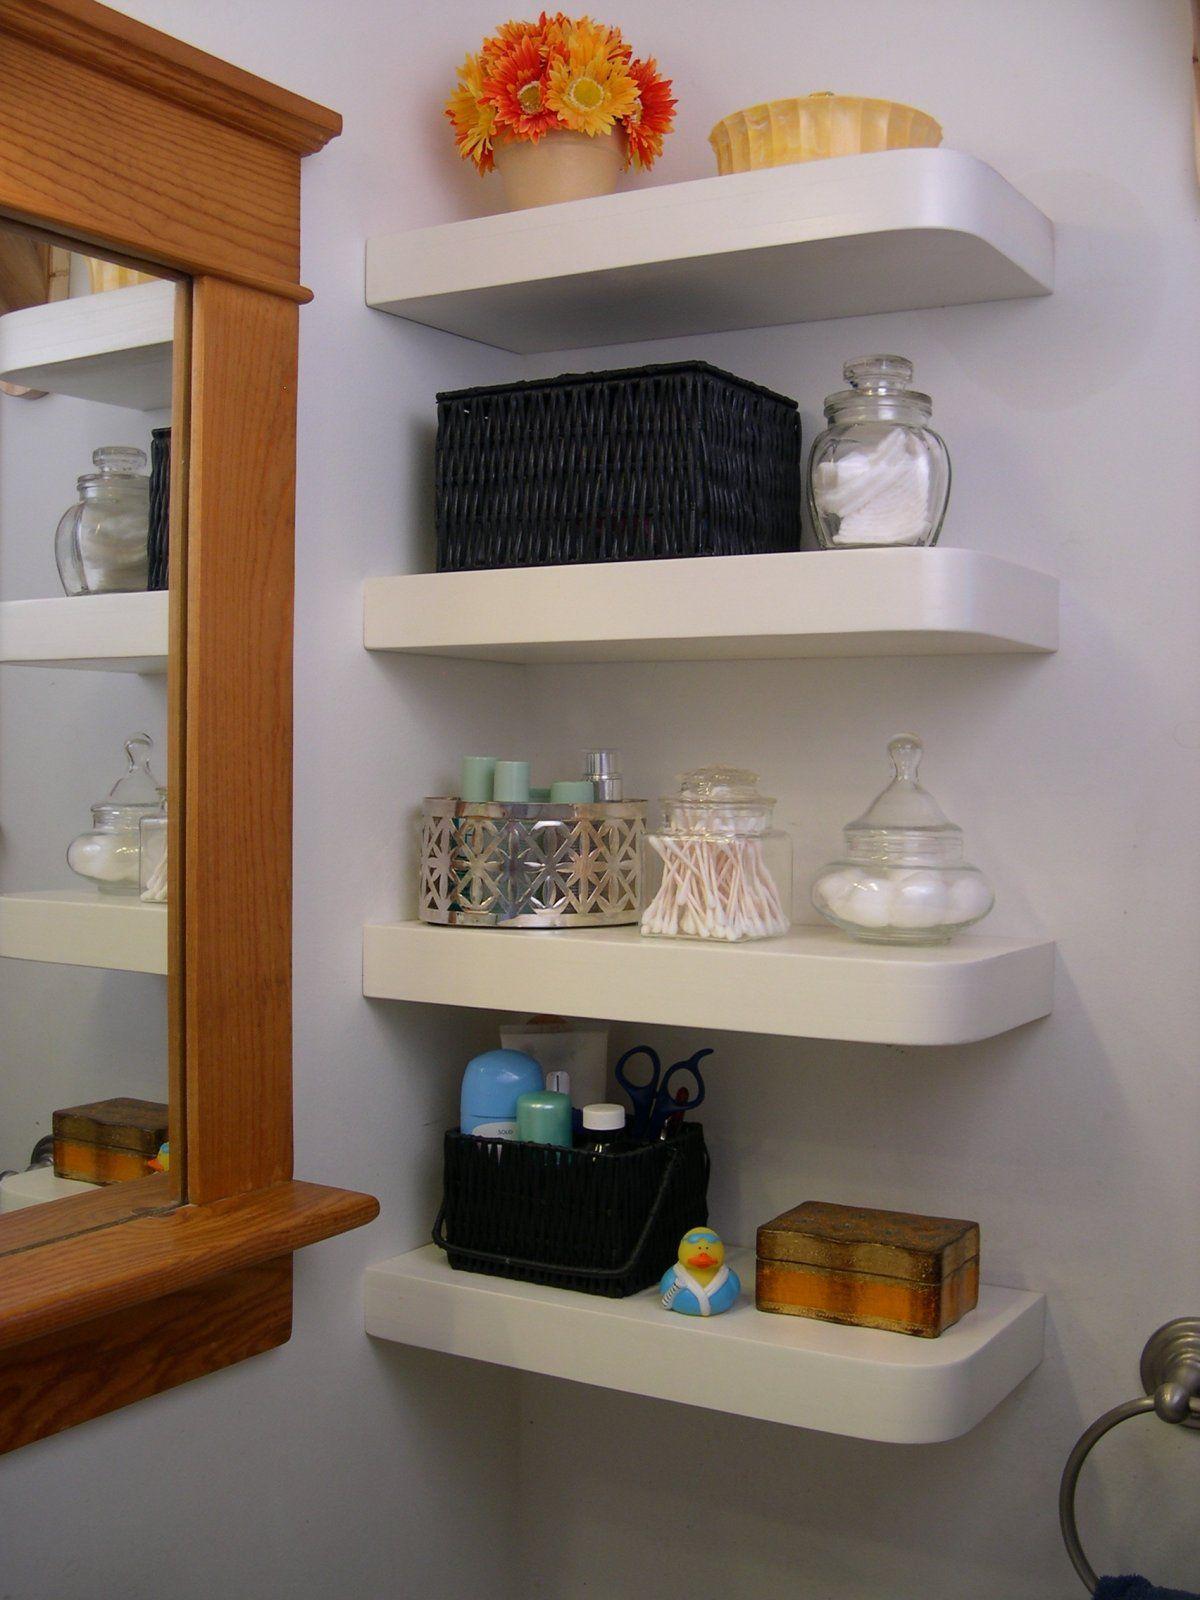 Shelves Bathroom Corners Wall Corner Shelf Floating Box